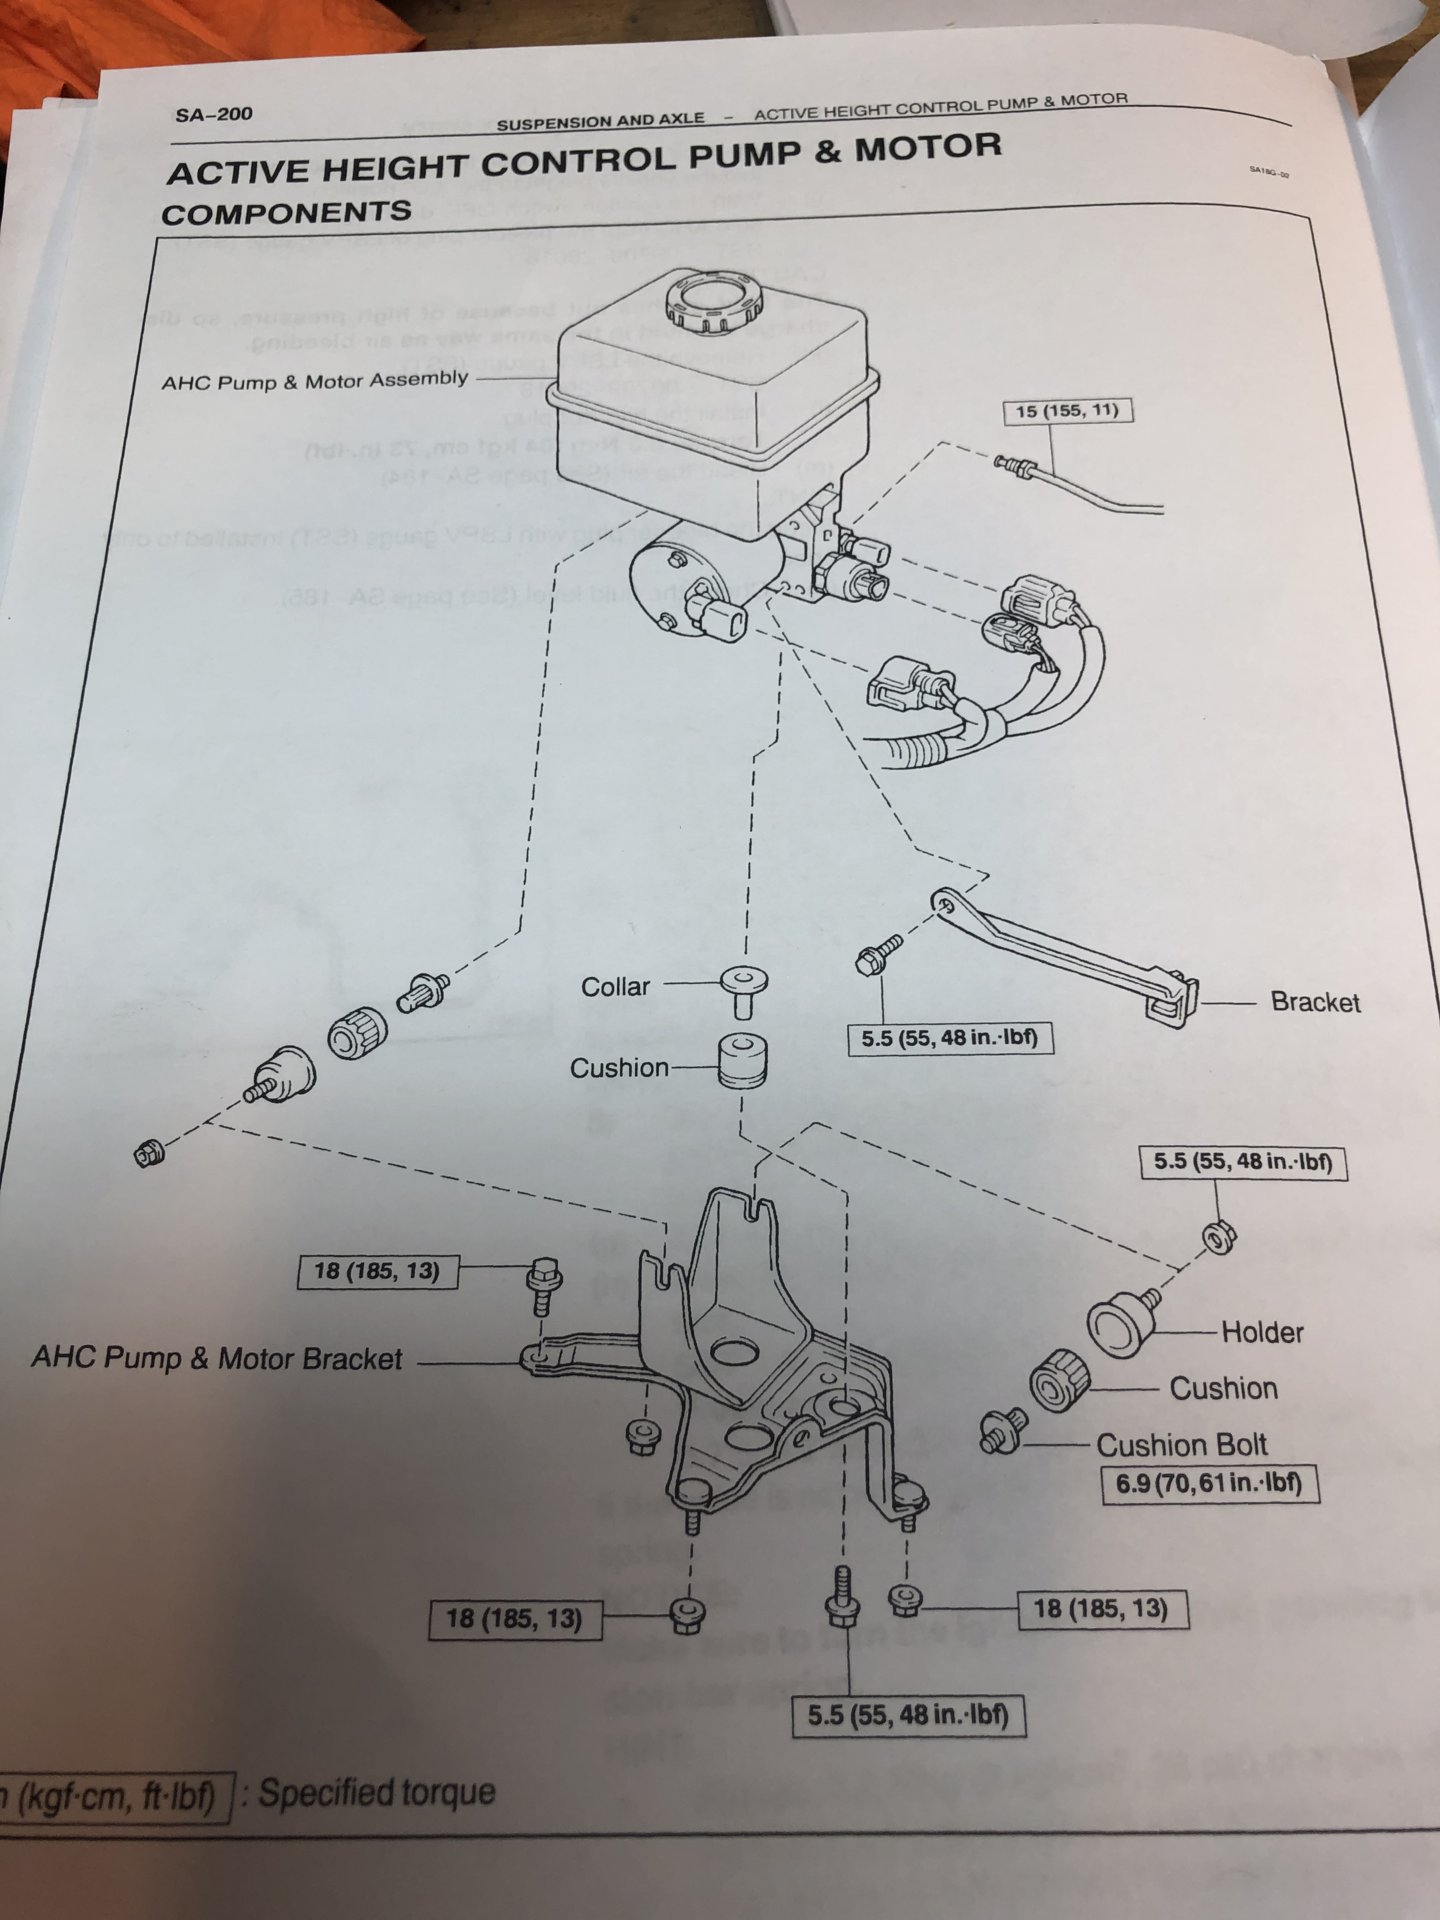 D5DF5F88-19E3-4C70-BBCF-419E198E1C1C.jpeg